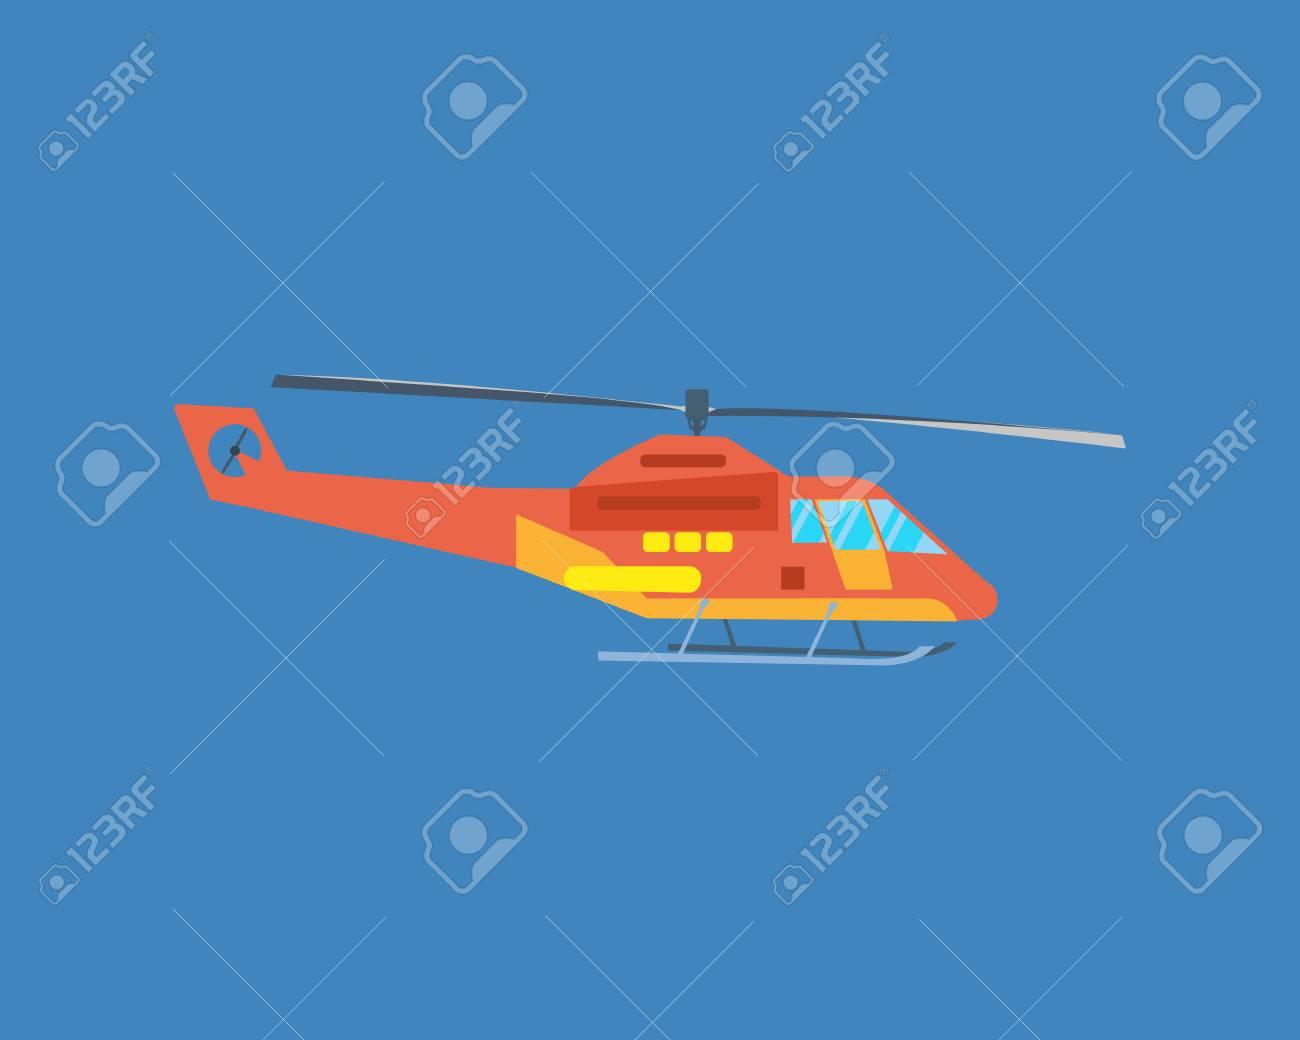 Air vehicles  Modern helicopter for passenger transportation